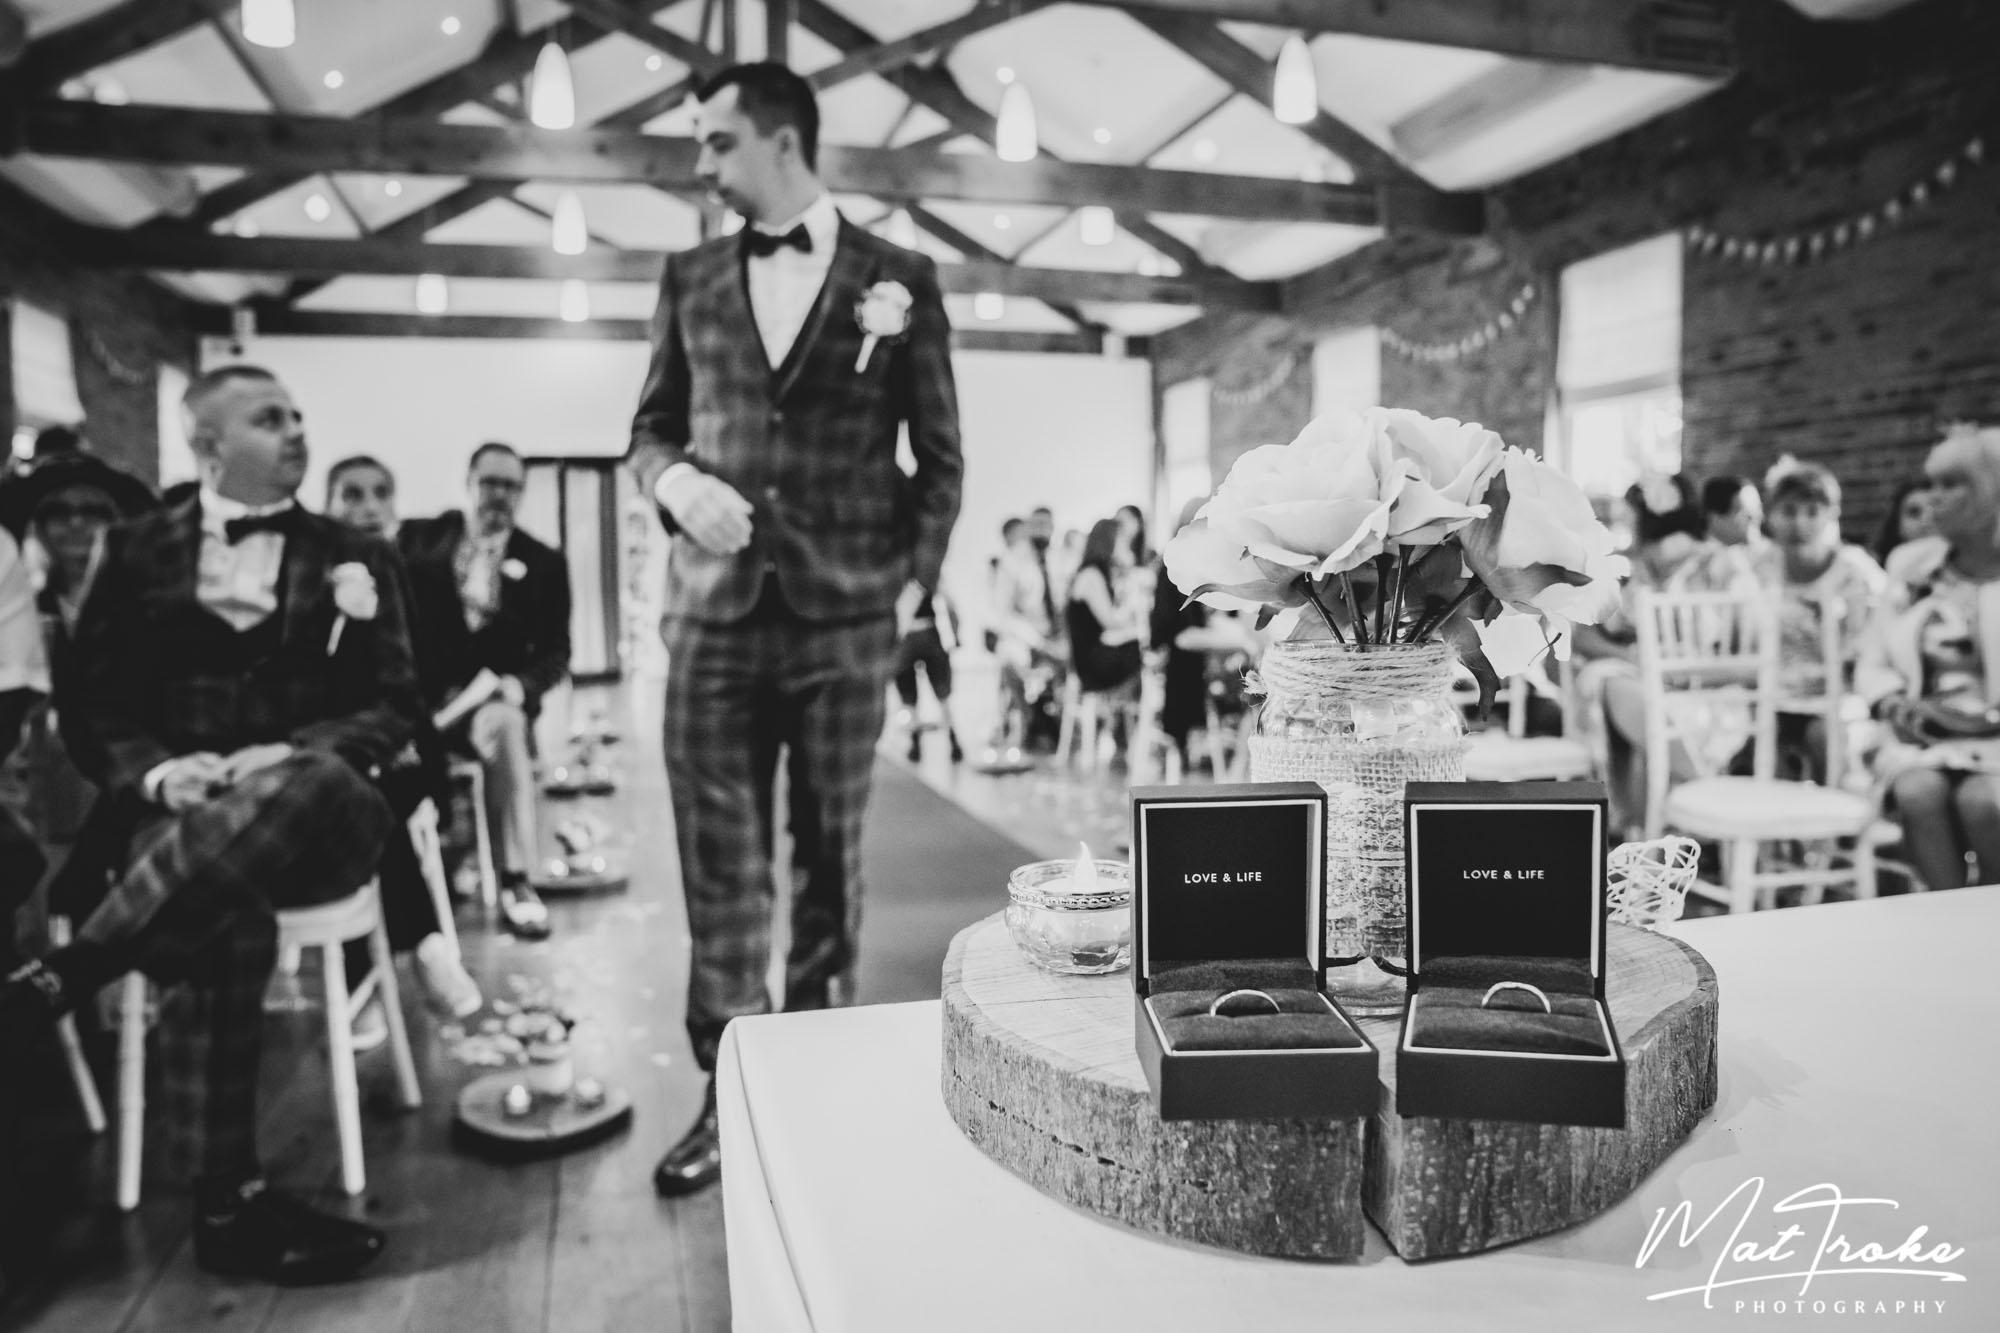 derby_nottingham_wedding_photographer_find_photography_derbyshire_nottinghamshire_bride_groom